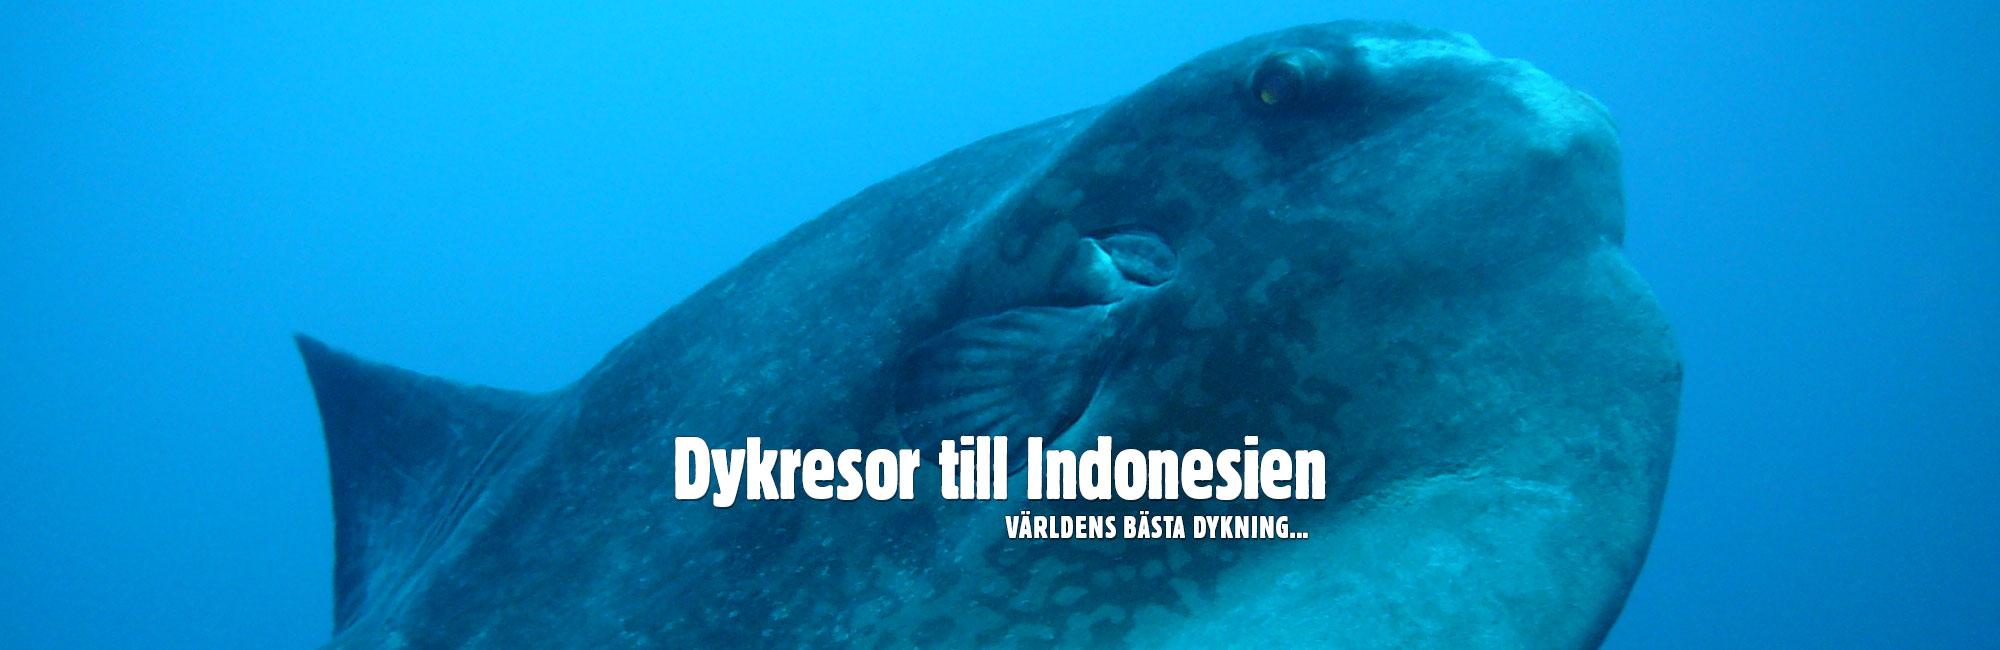 Bali dykning